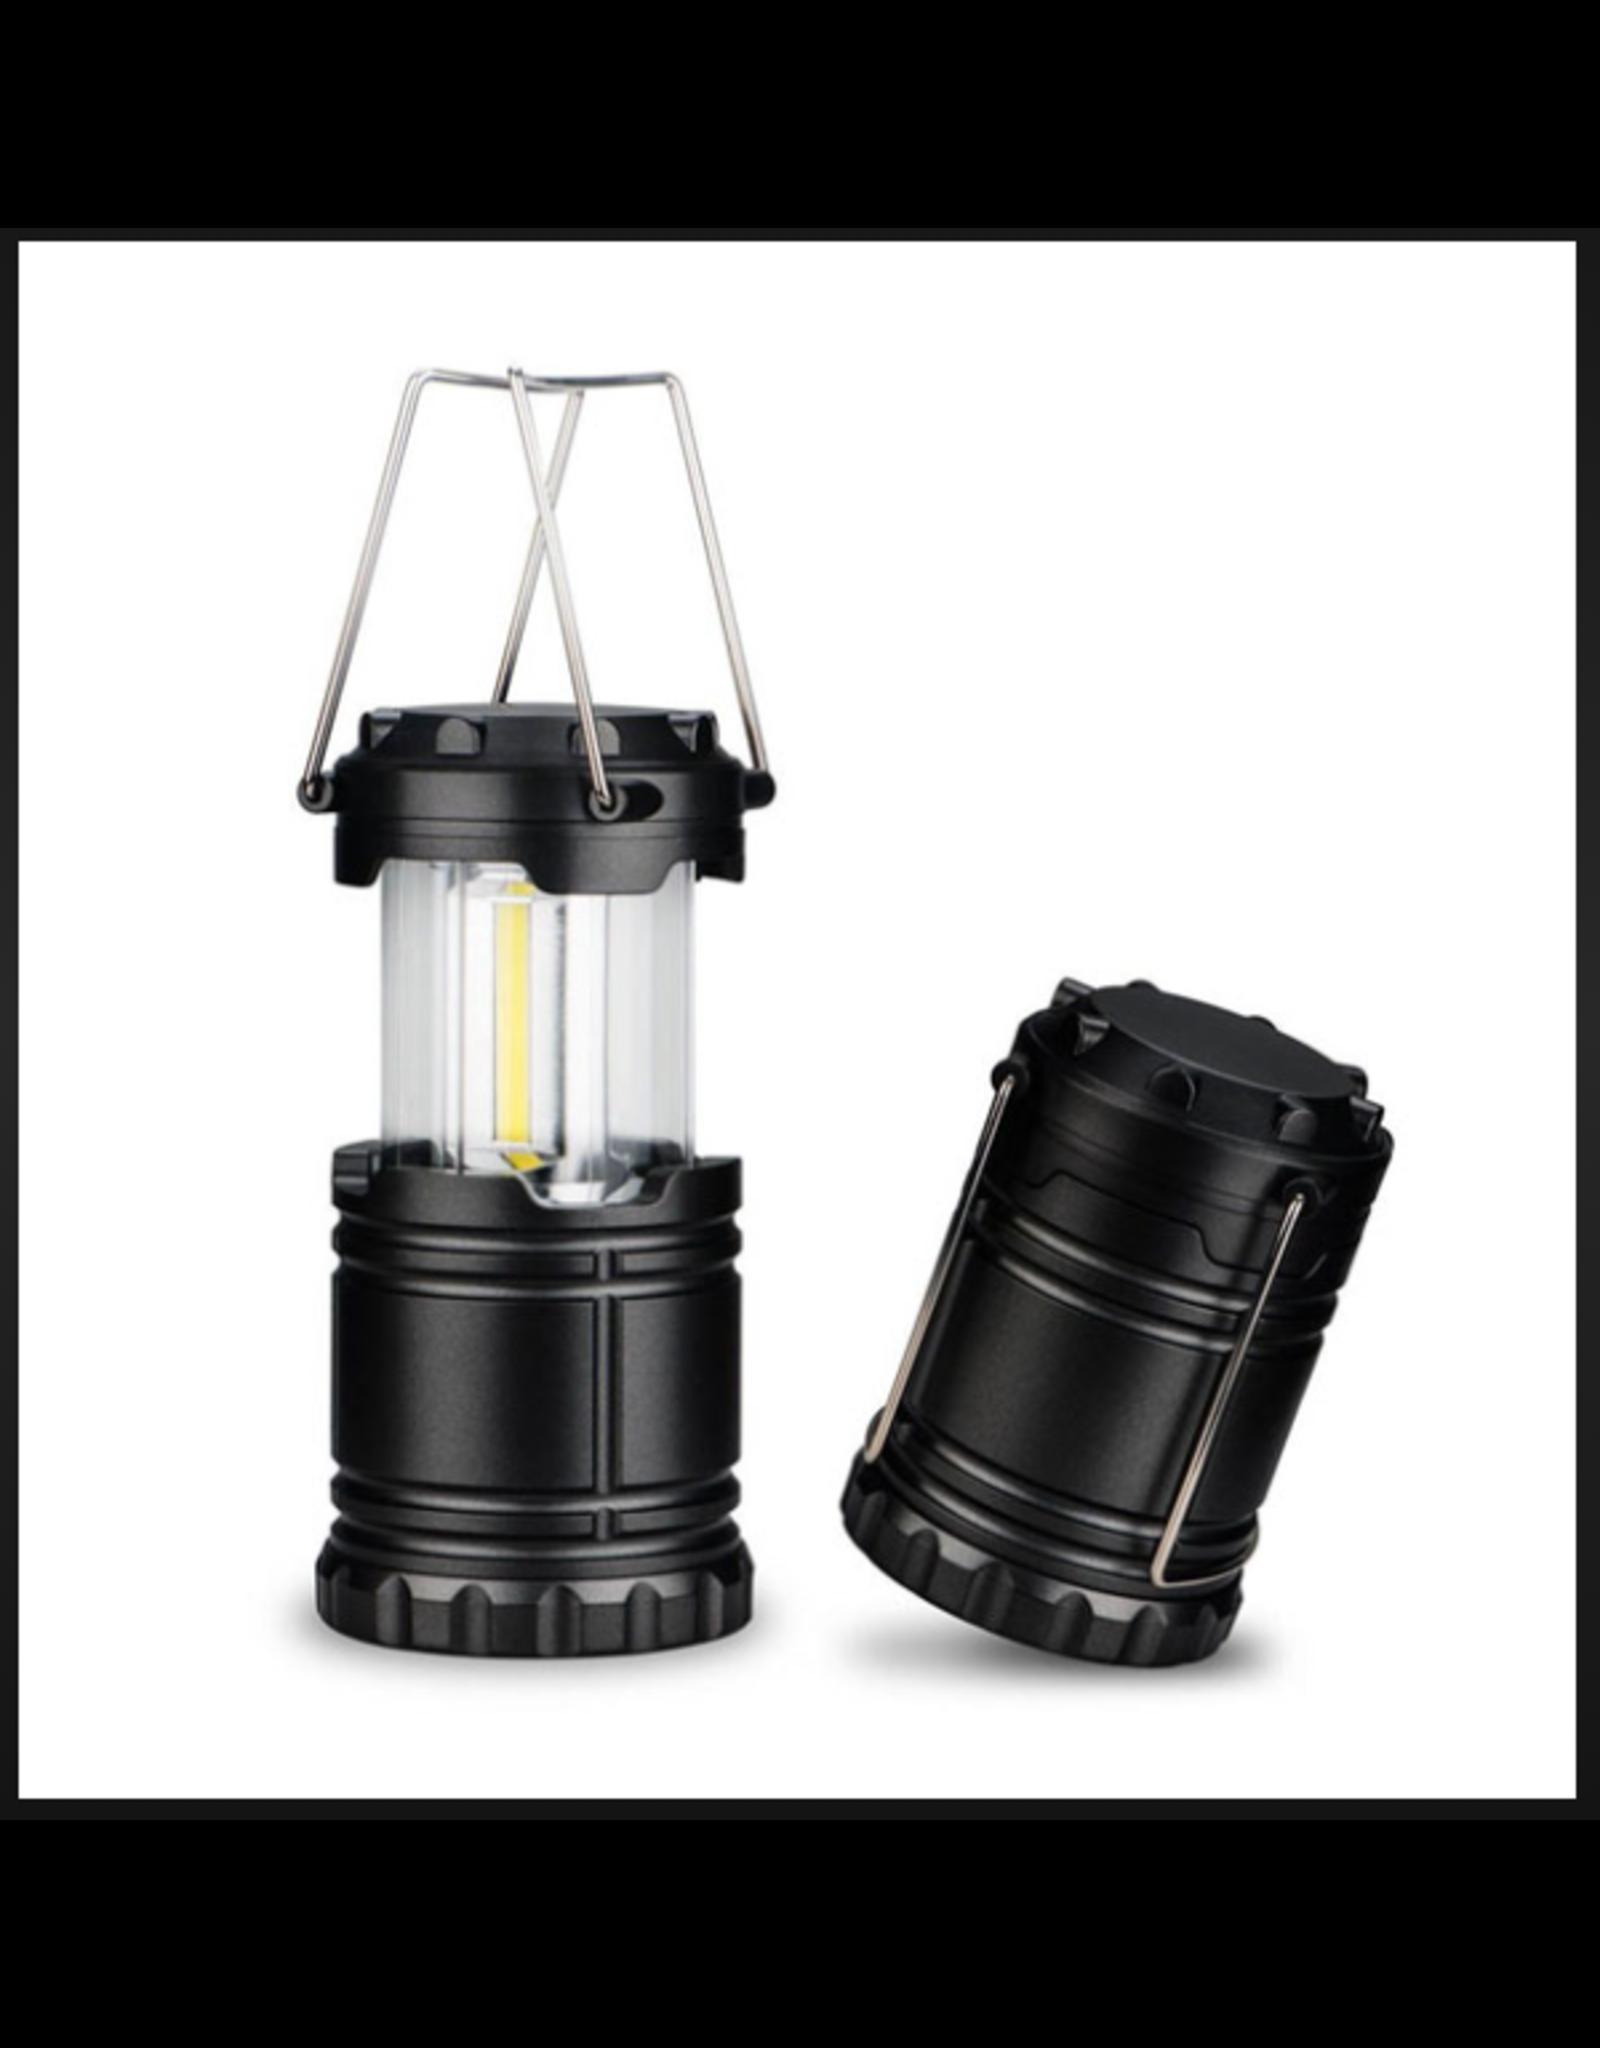 Diamond Visions Pop-Up Cob LED Lantern